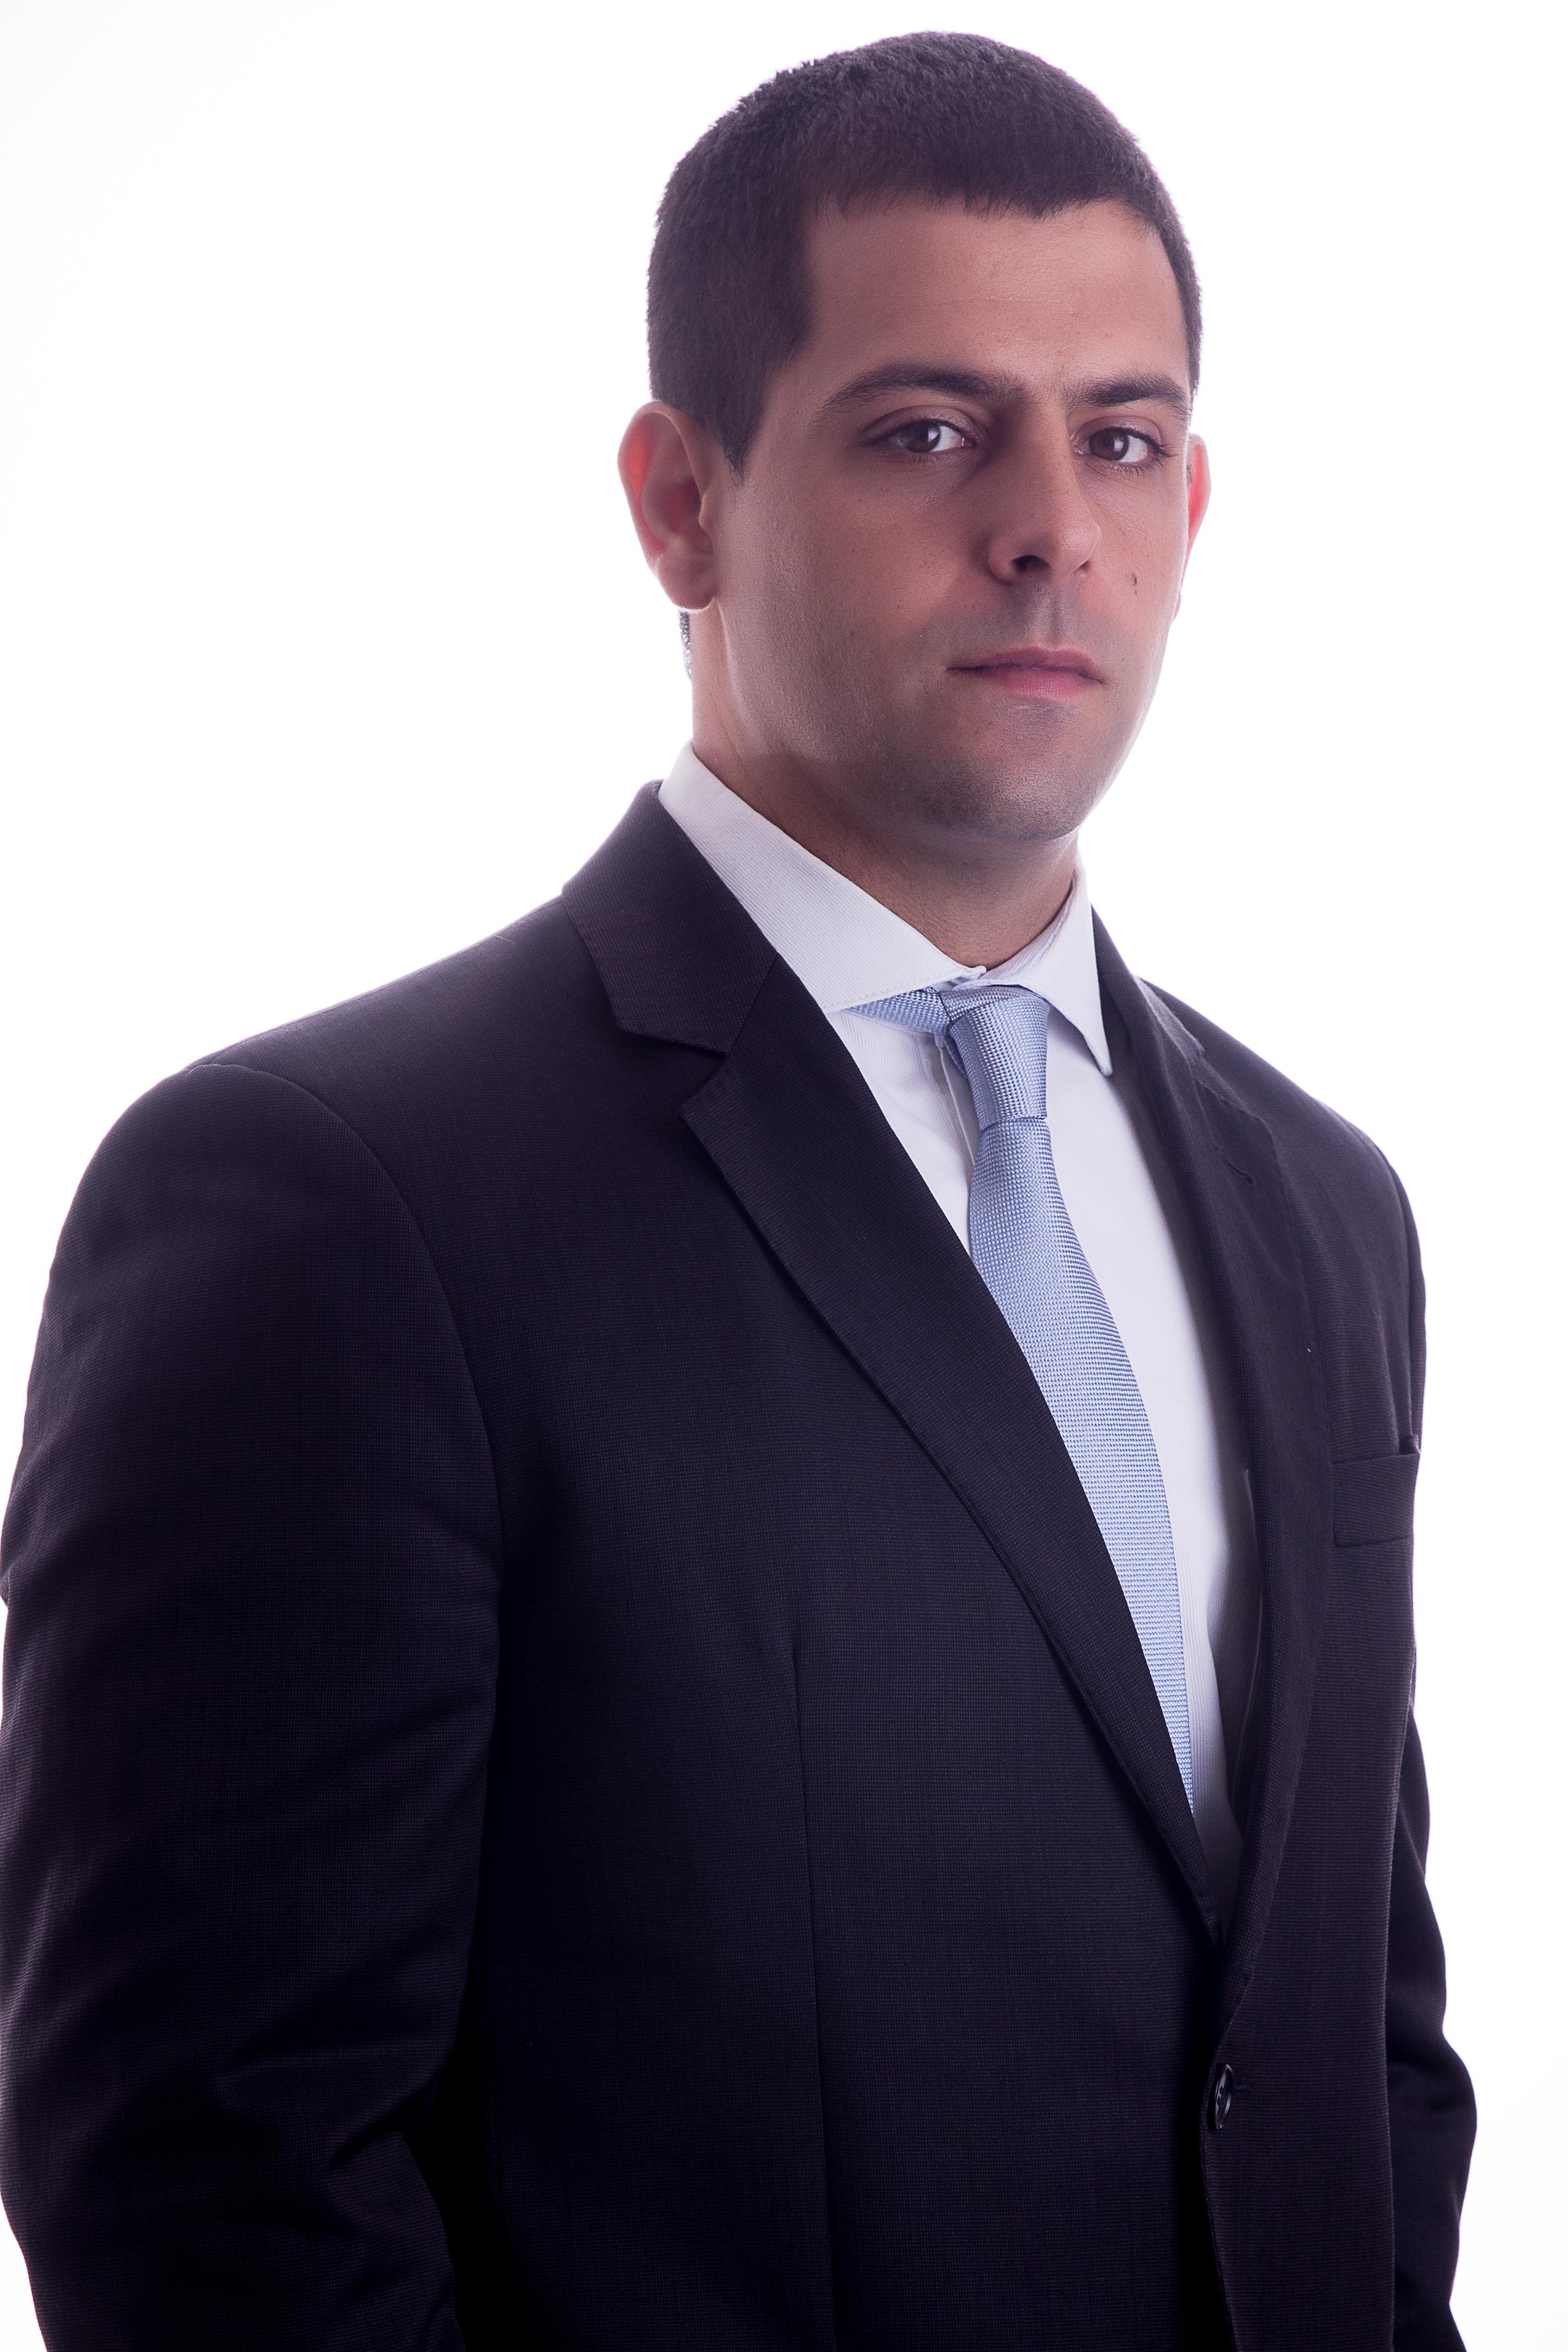 Tomás Colacino Daudt de Oliveira   tomas.daudt@daudtadvogados.com.br